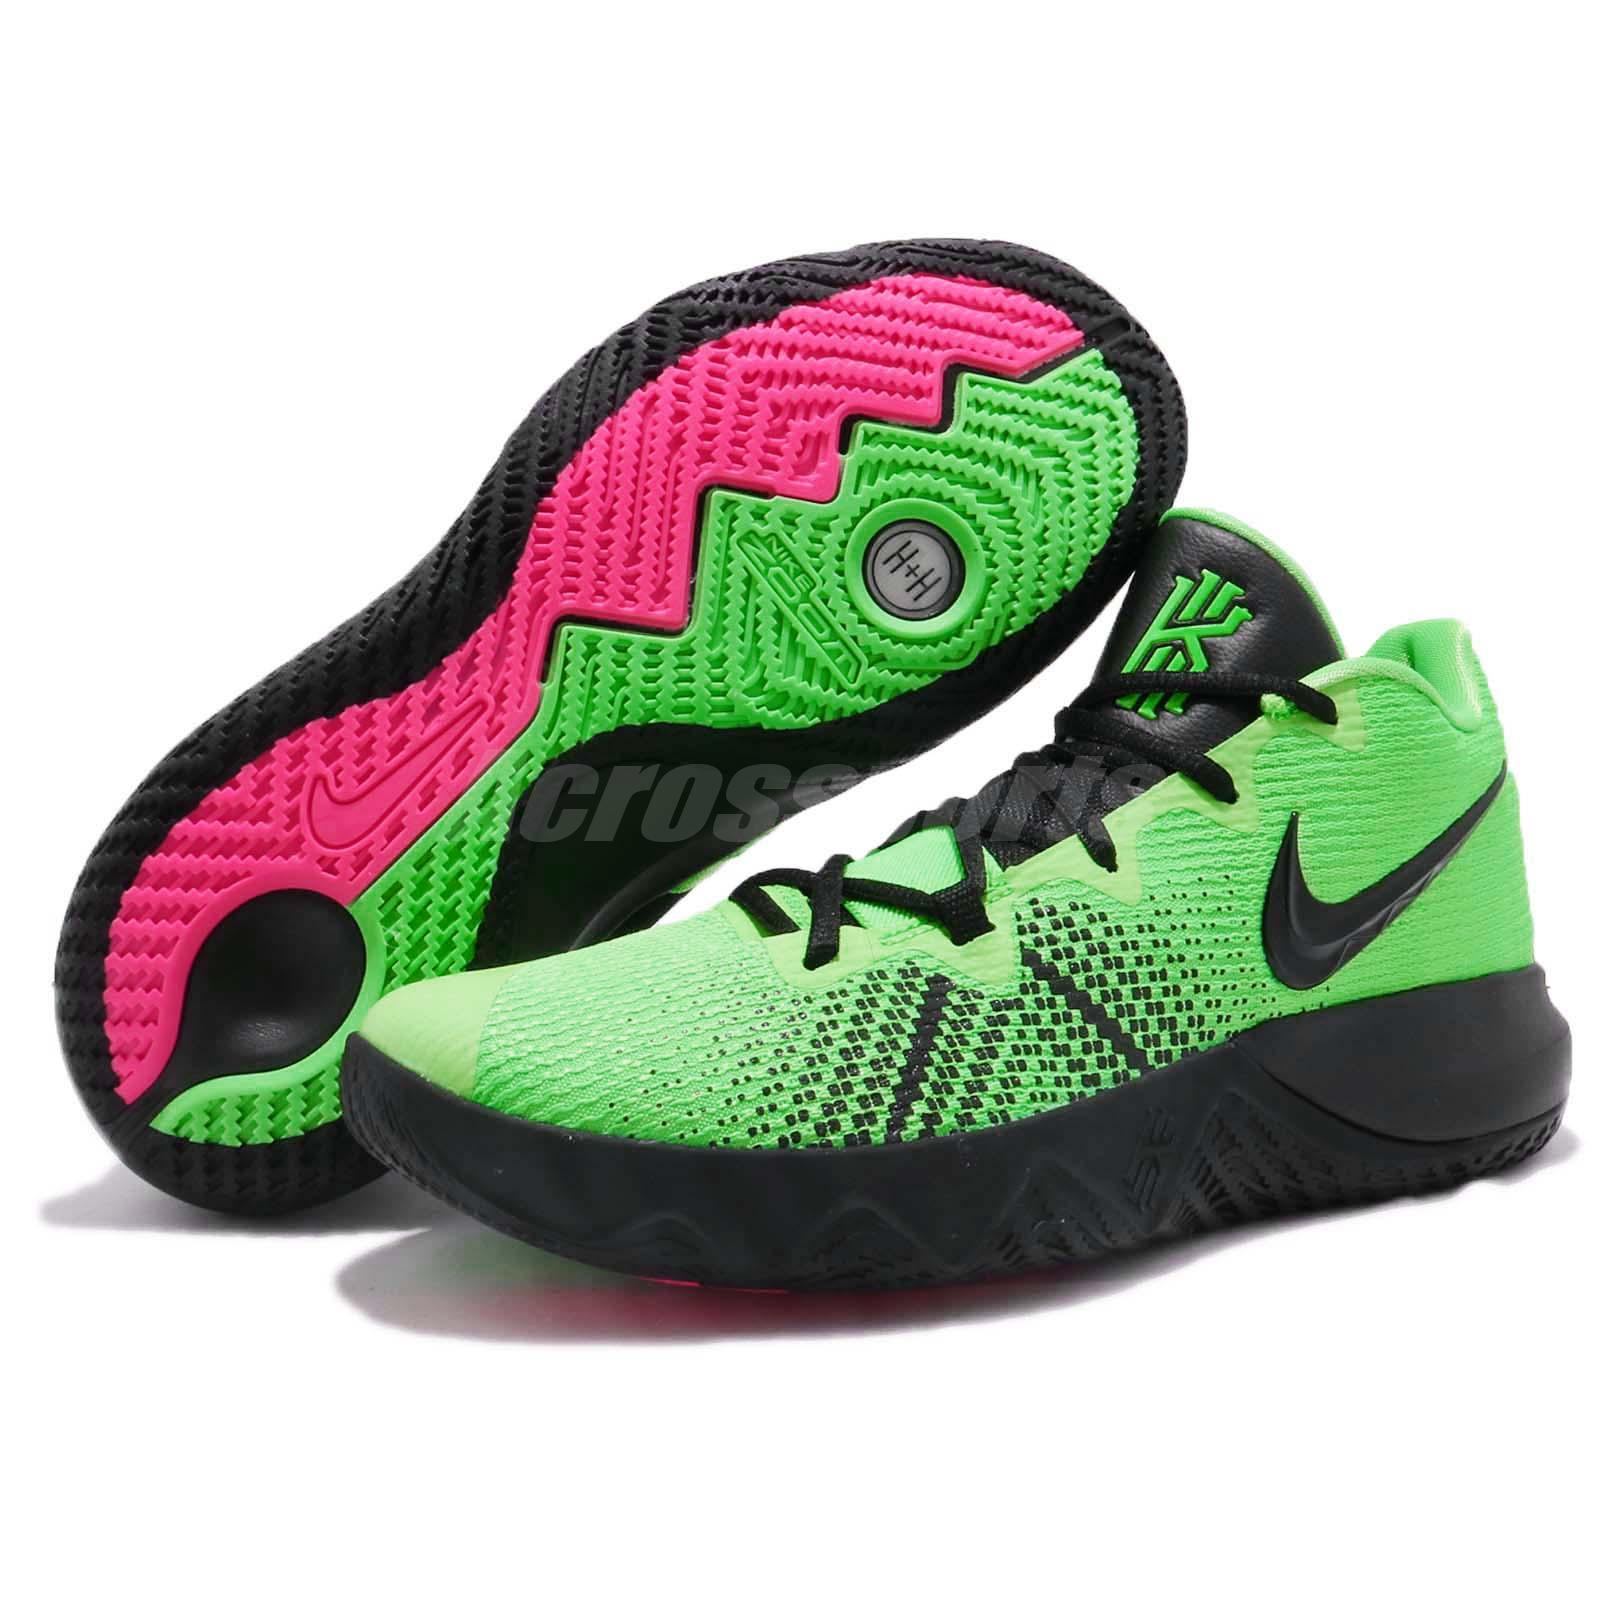 4d07eba76fde Nike Kyrie Flytrap EP Irving Rage Green Black Men Basketball Shoes ...